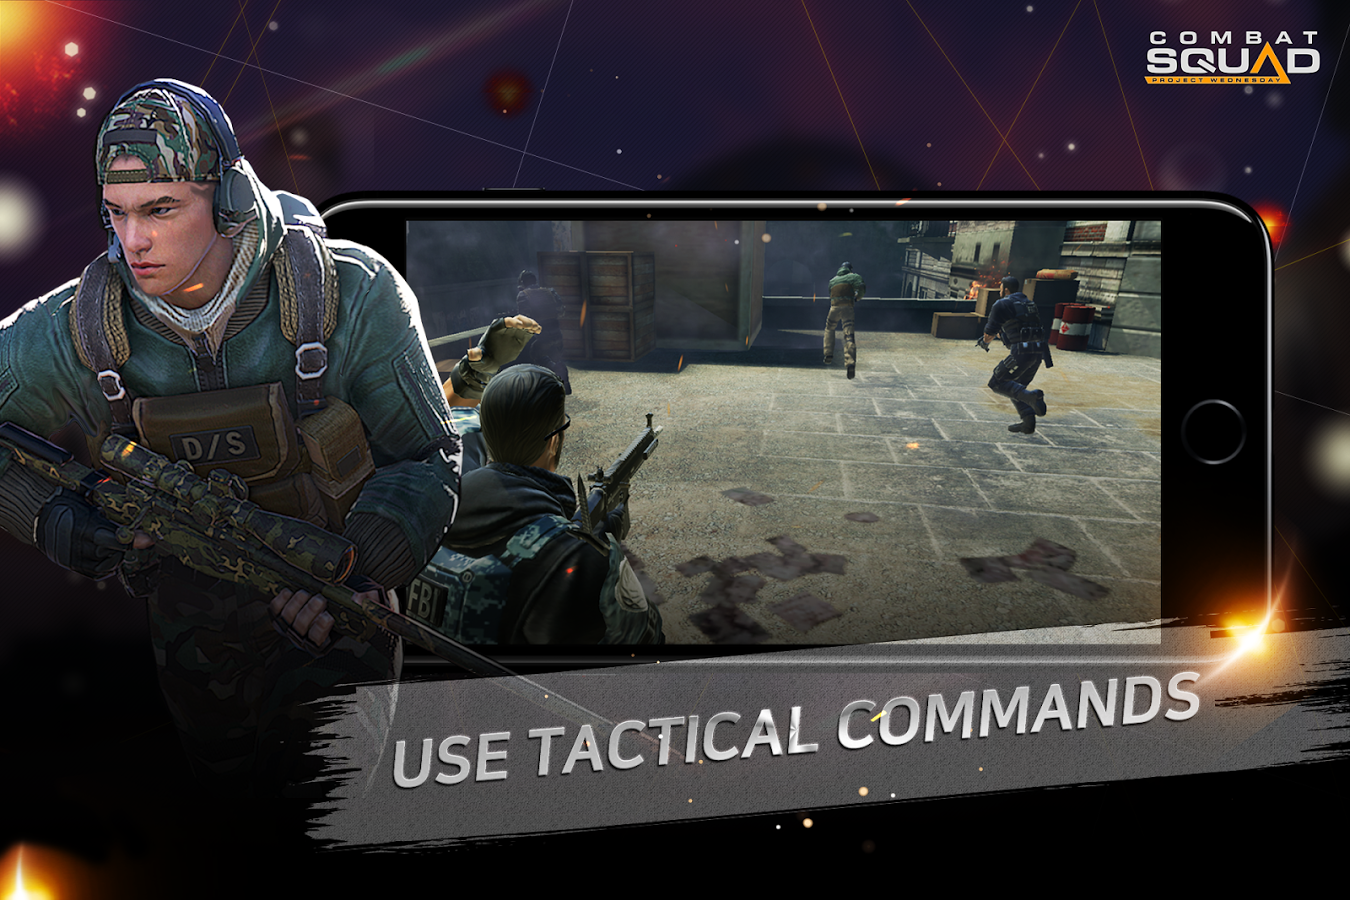 Combat Squad MOD APK Android v0.3.5 Download